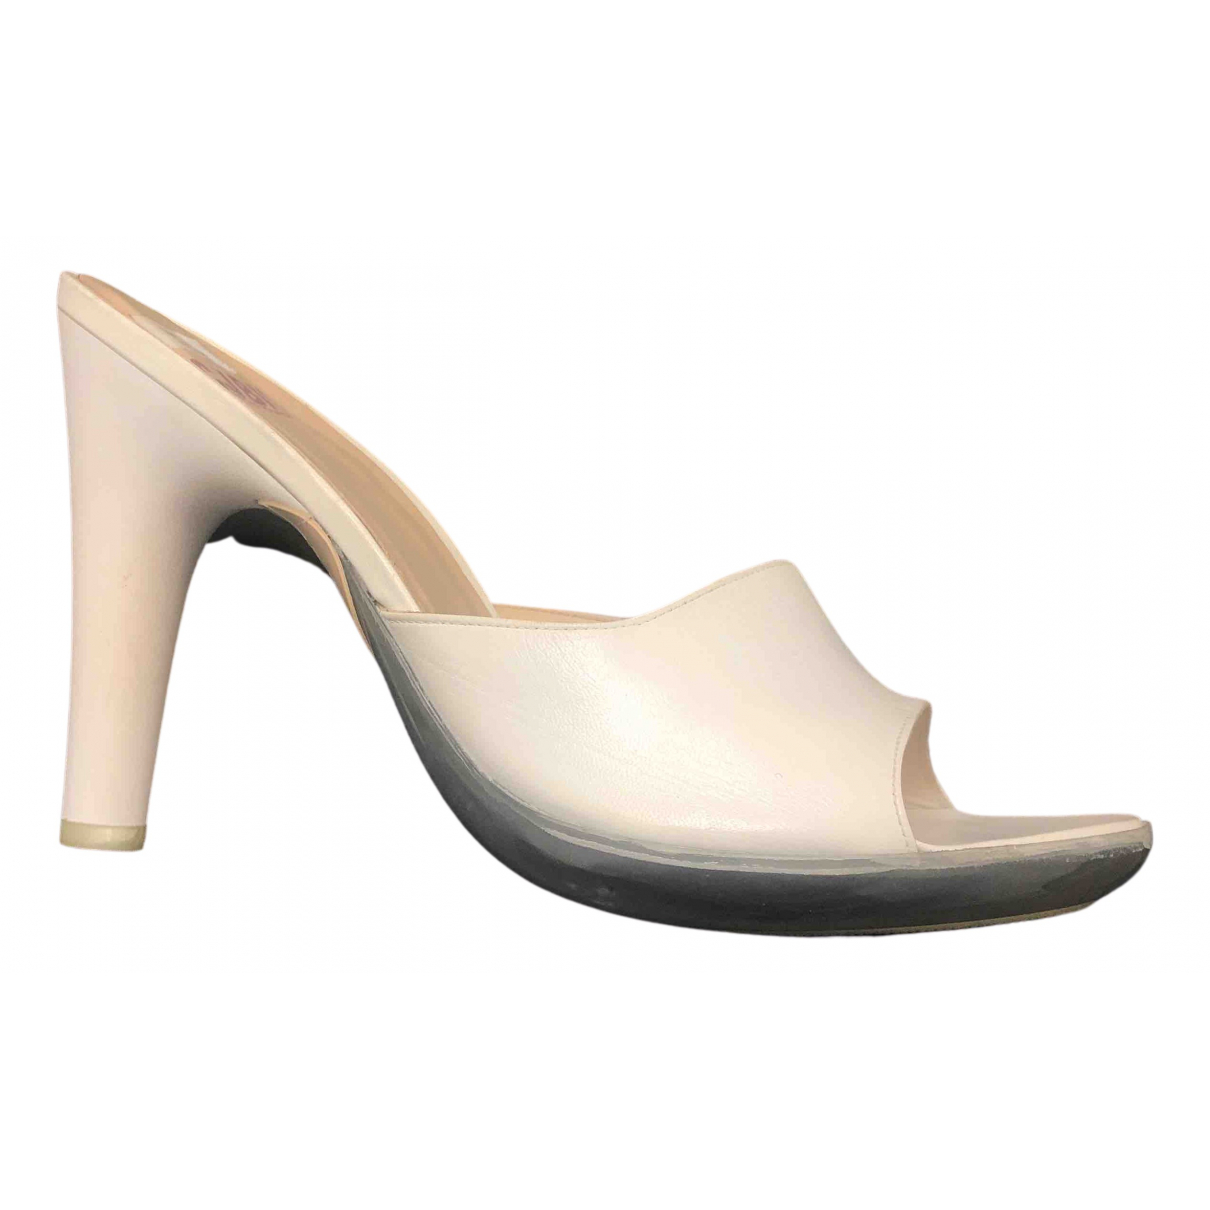 Charles Jourdan - Sabots   pour femme en cuir - blanc